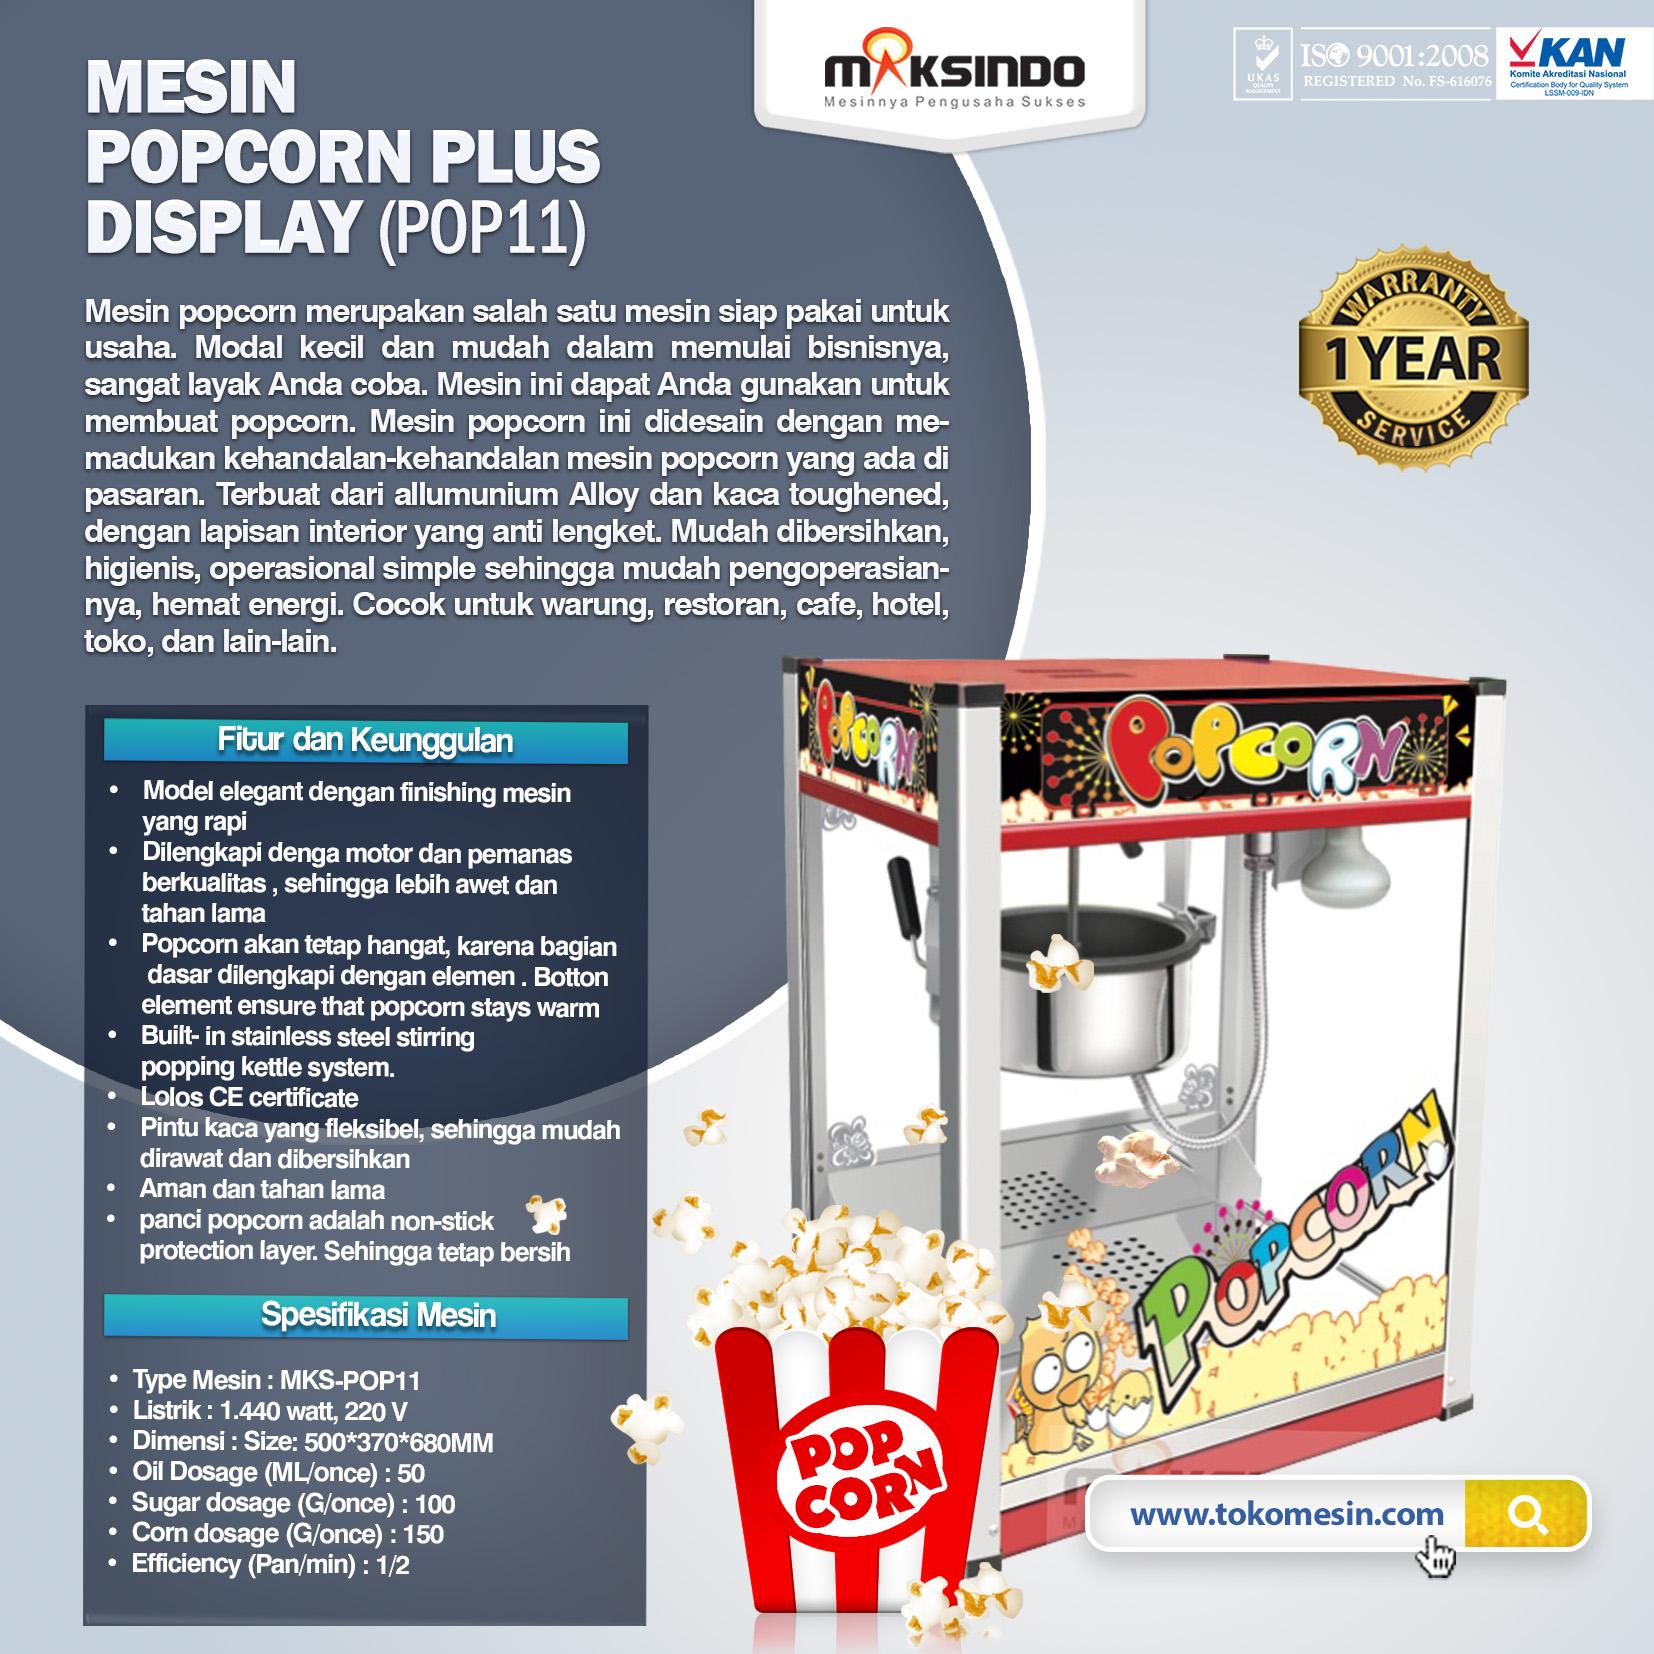 Mesin Popcorn Plus Display (POP11)